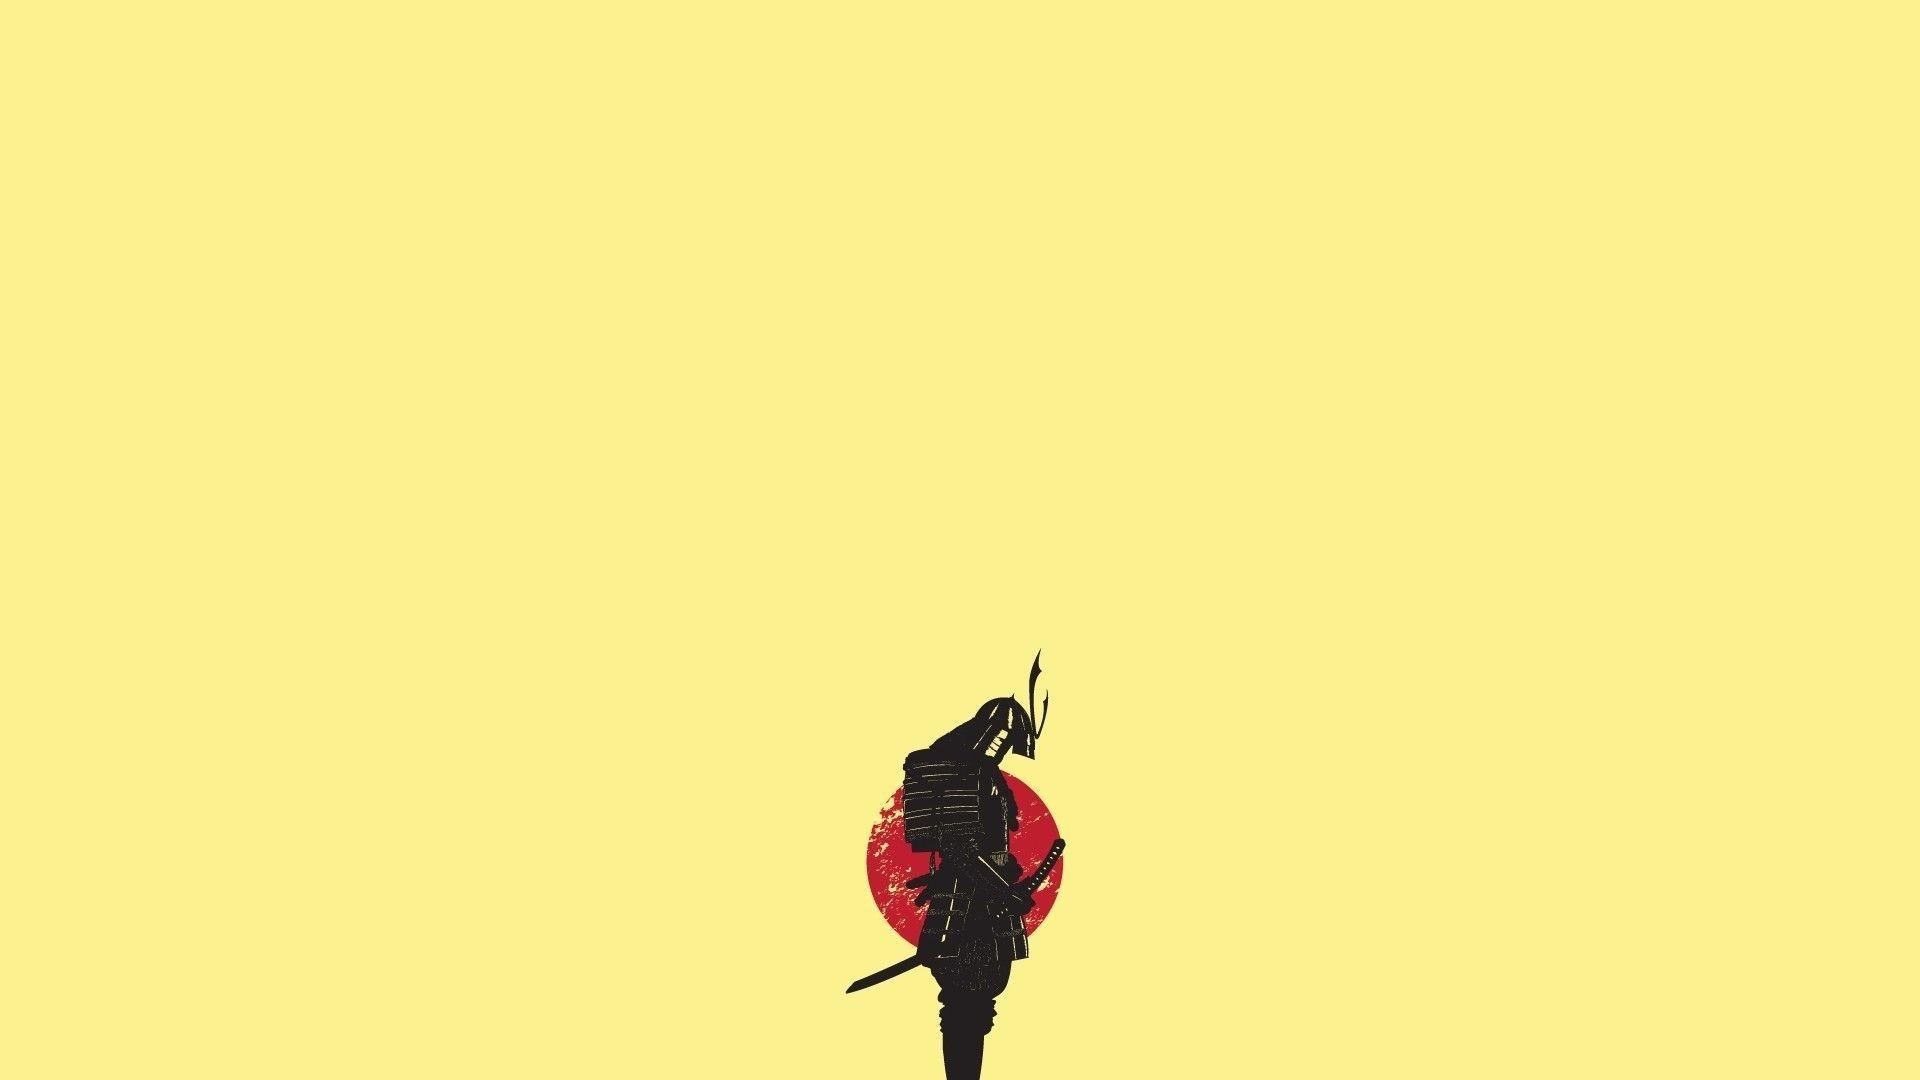 Samurai HD Wallpaper 1920×1080